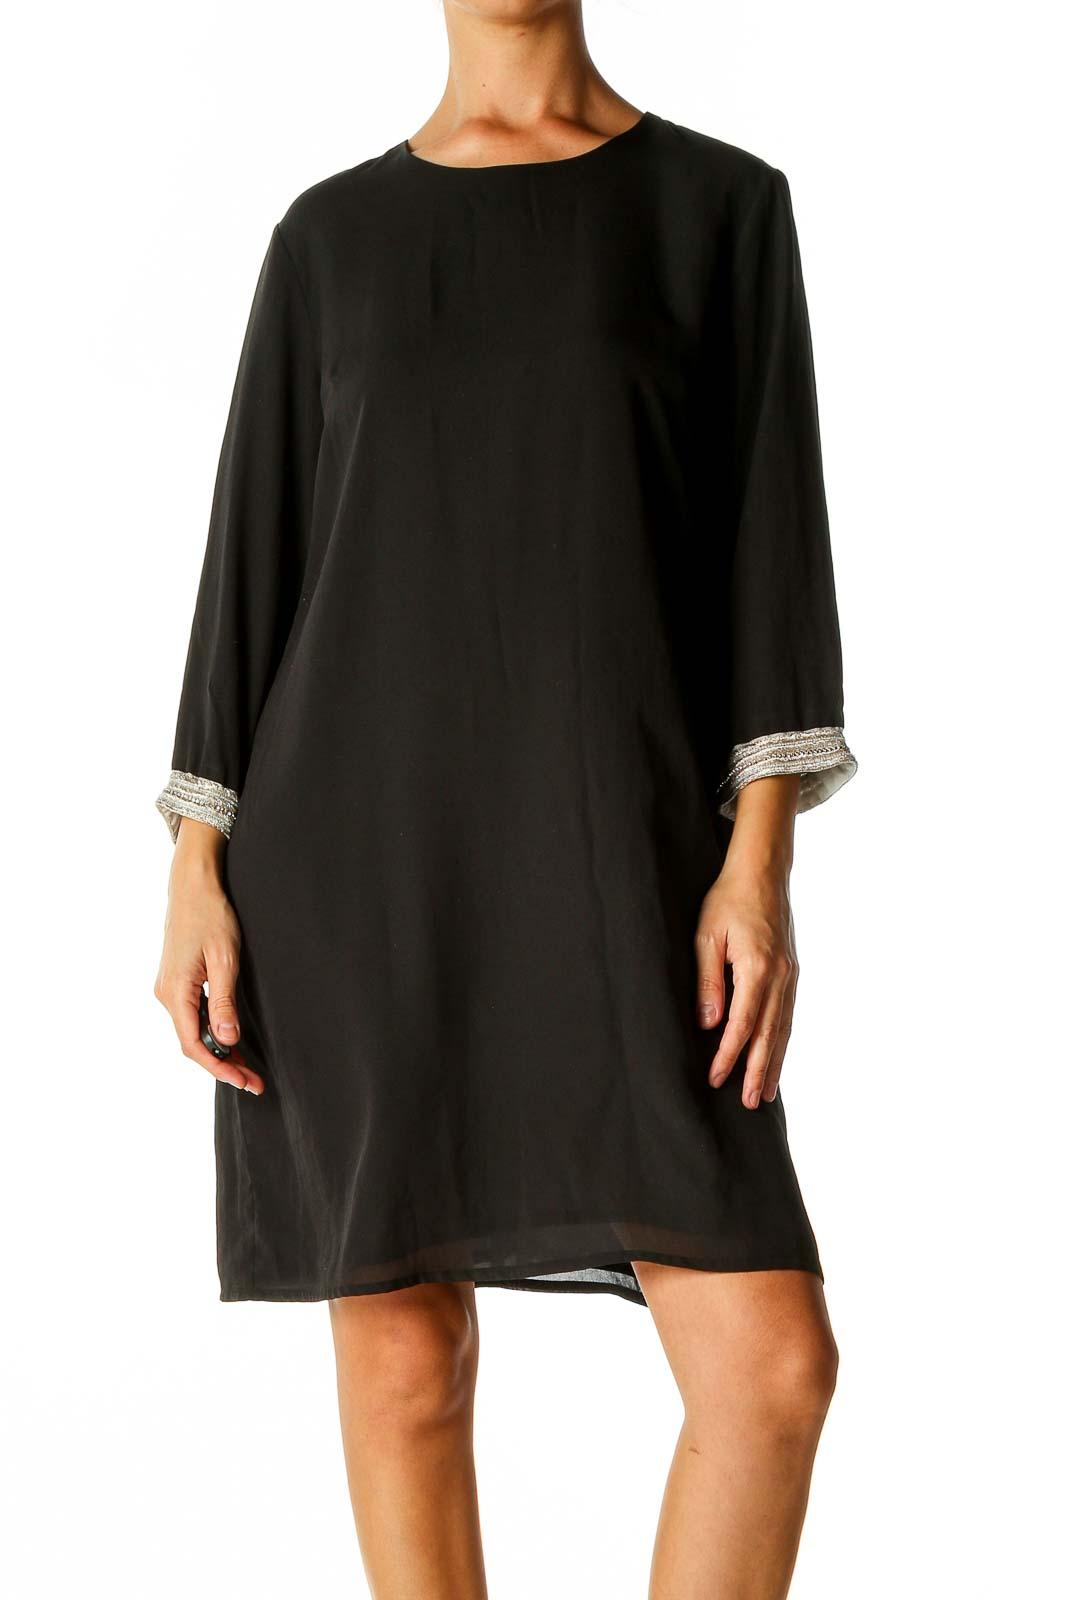 Black Solid Classic Shift Dress Front